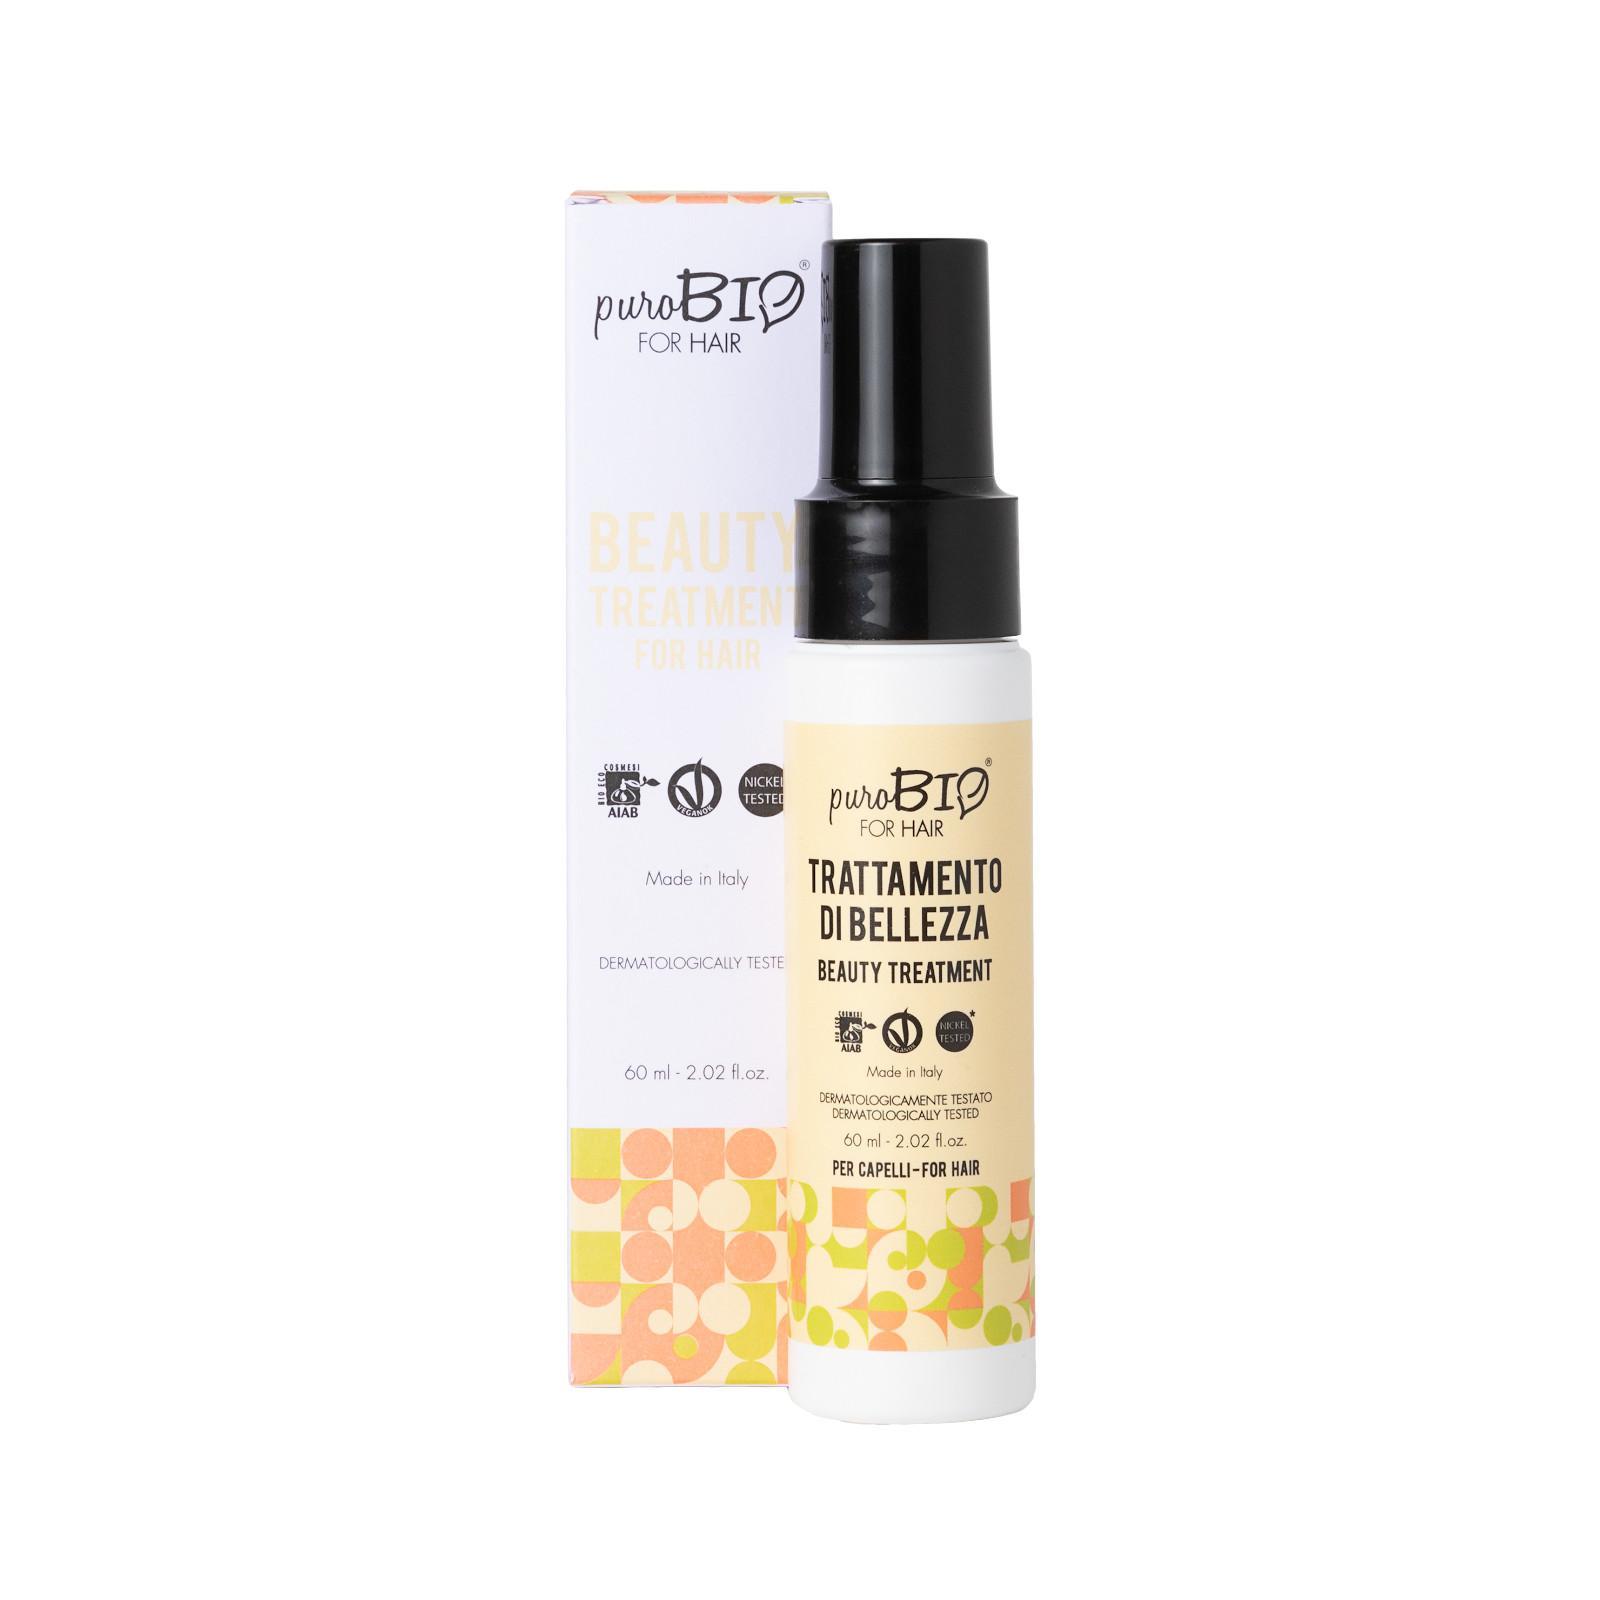 puroBIO cosmetics for Hair Beauty Treatment 60 ml